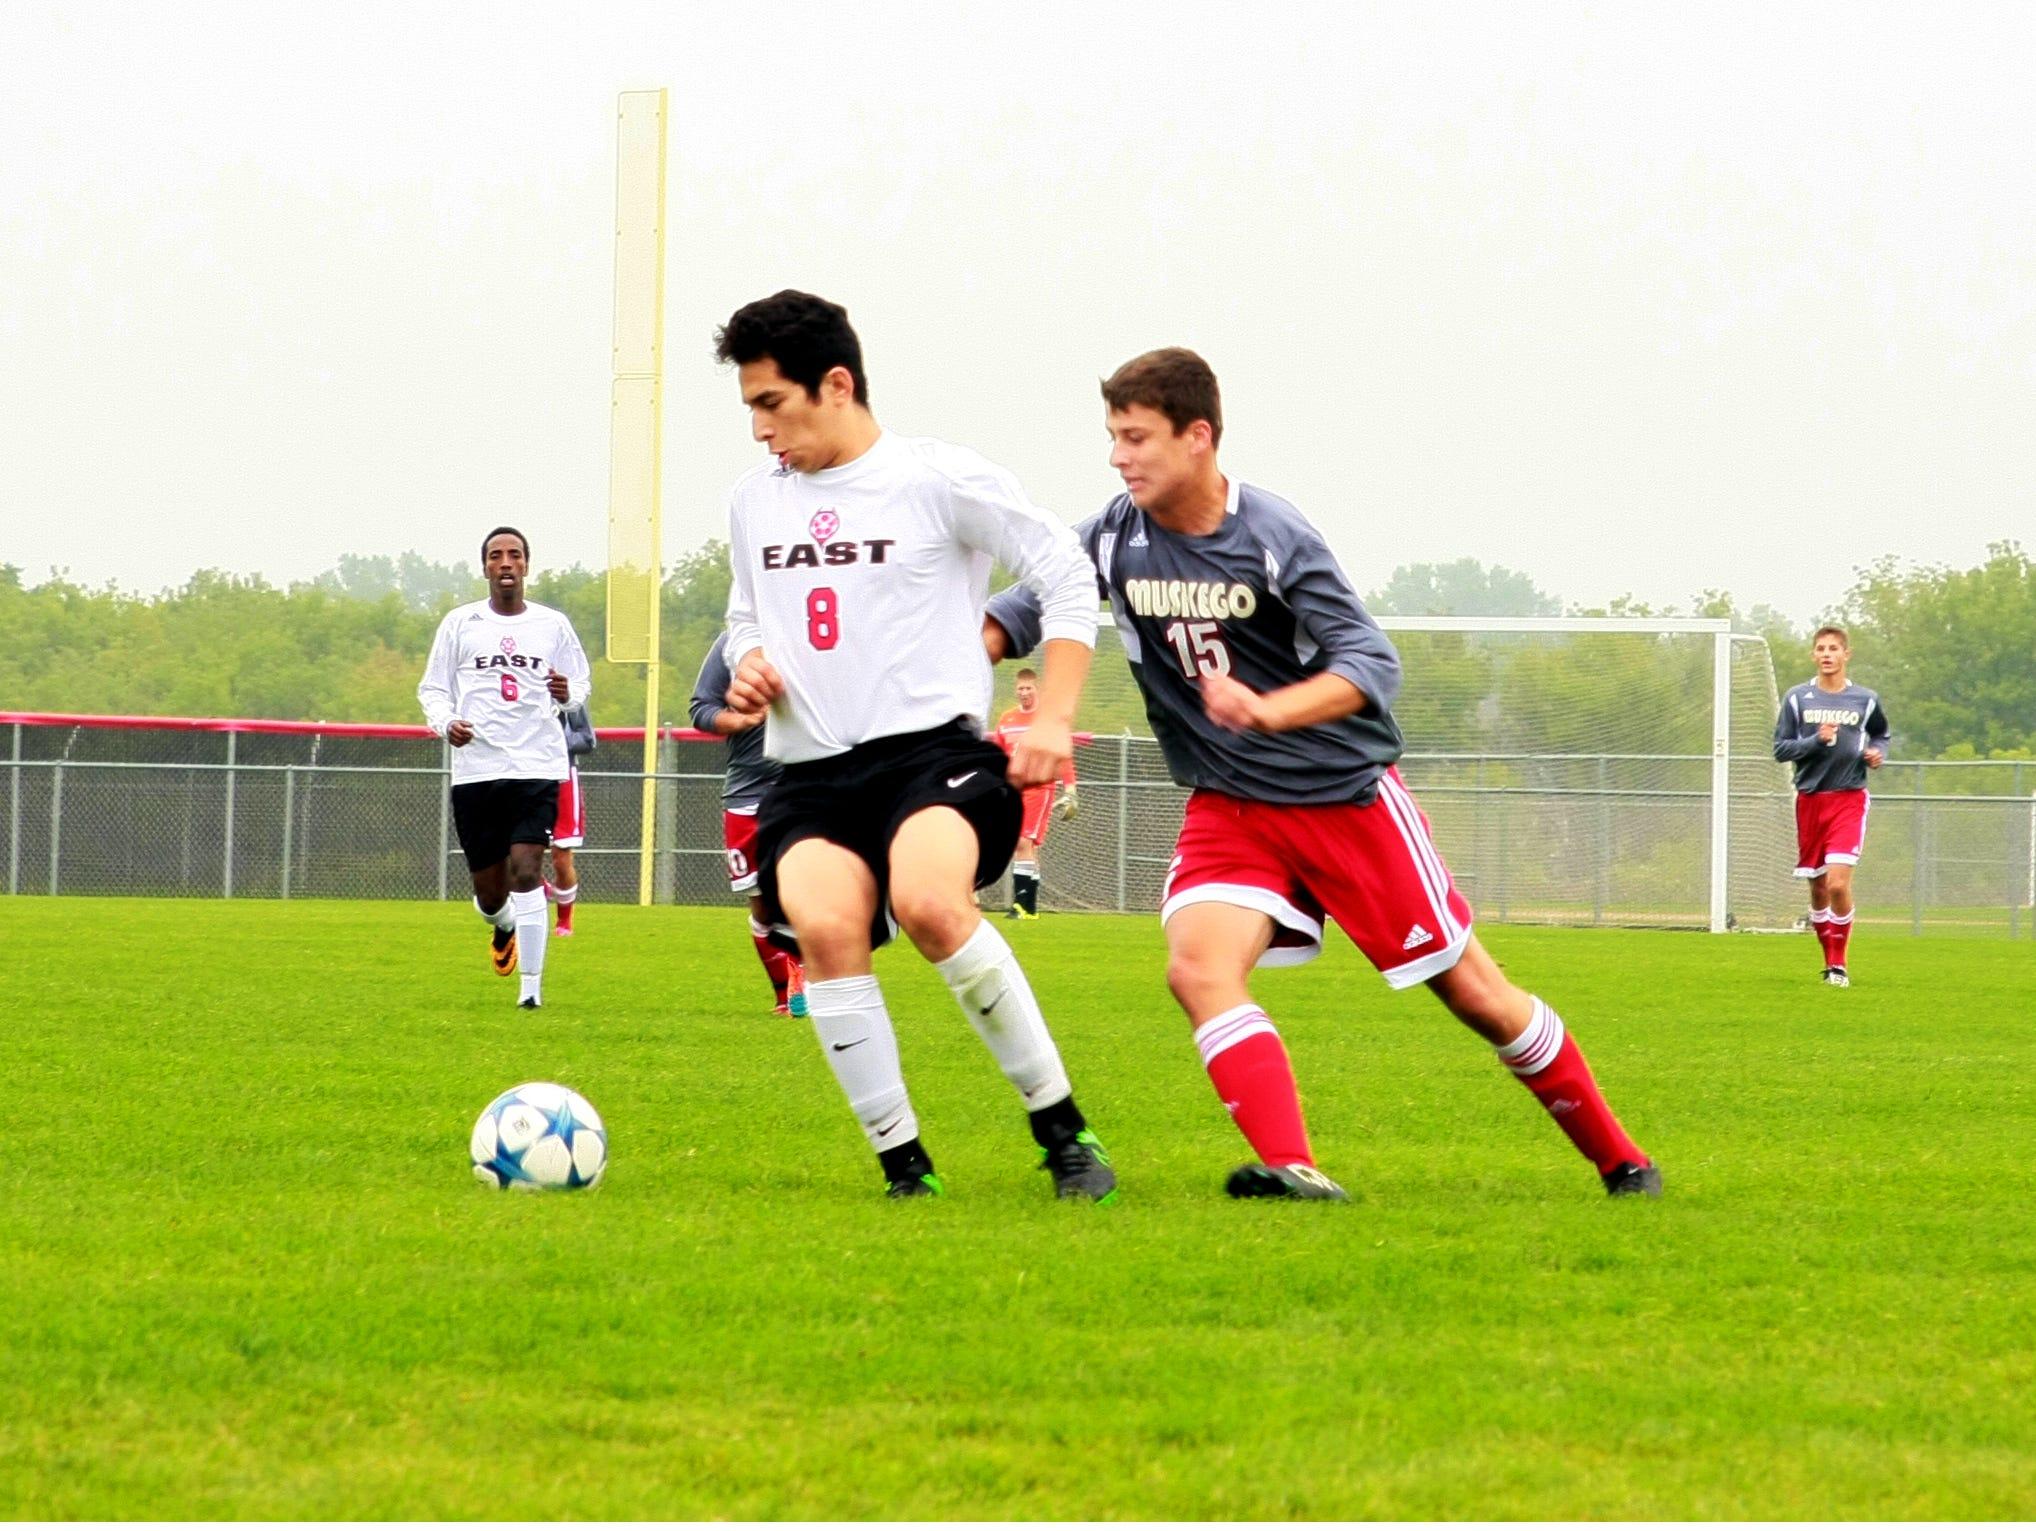 Green Bay East senior defender Tony Ramirez (8) will help lead the Red Devils.